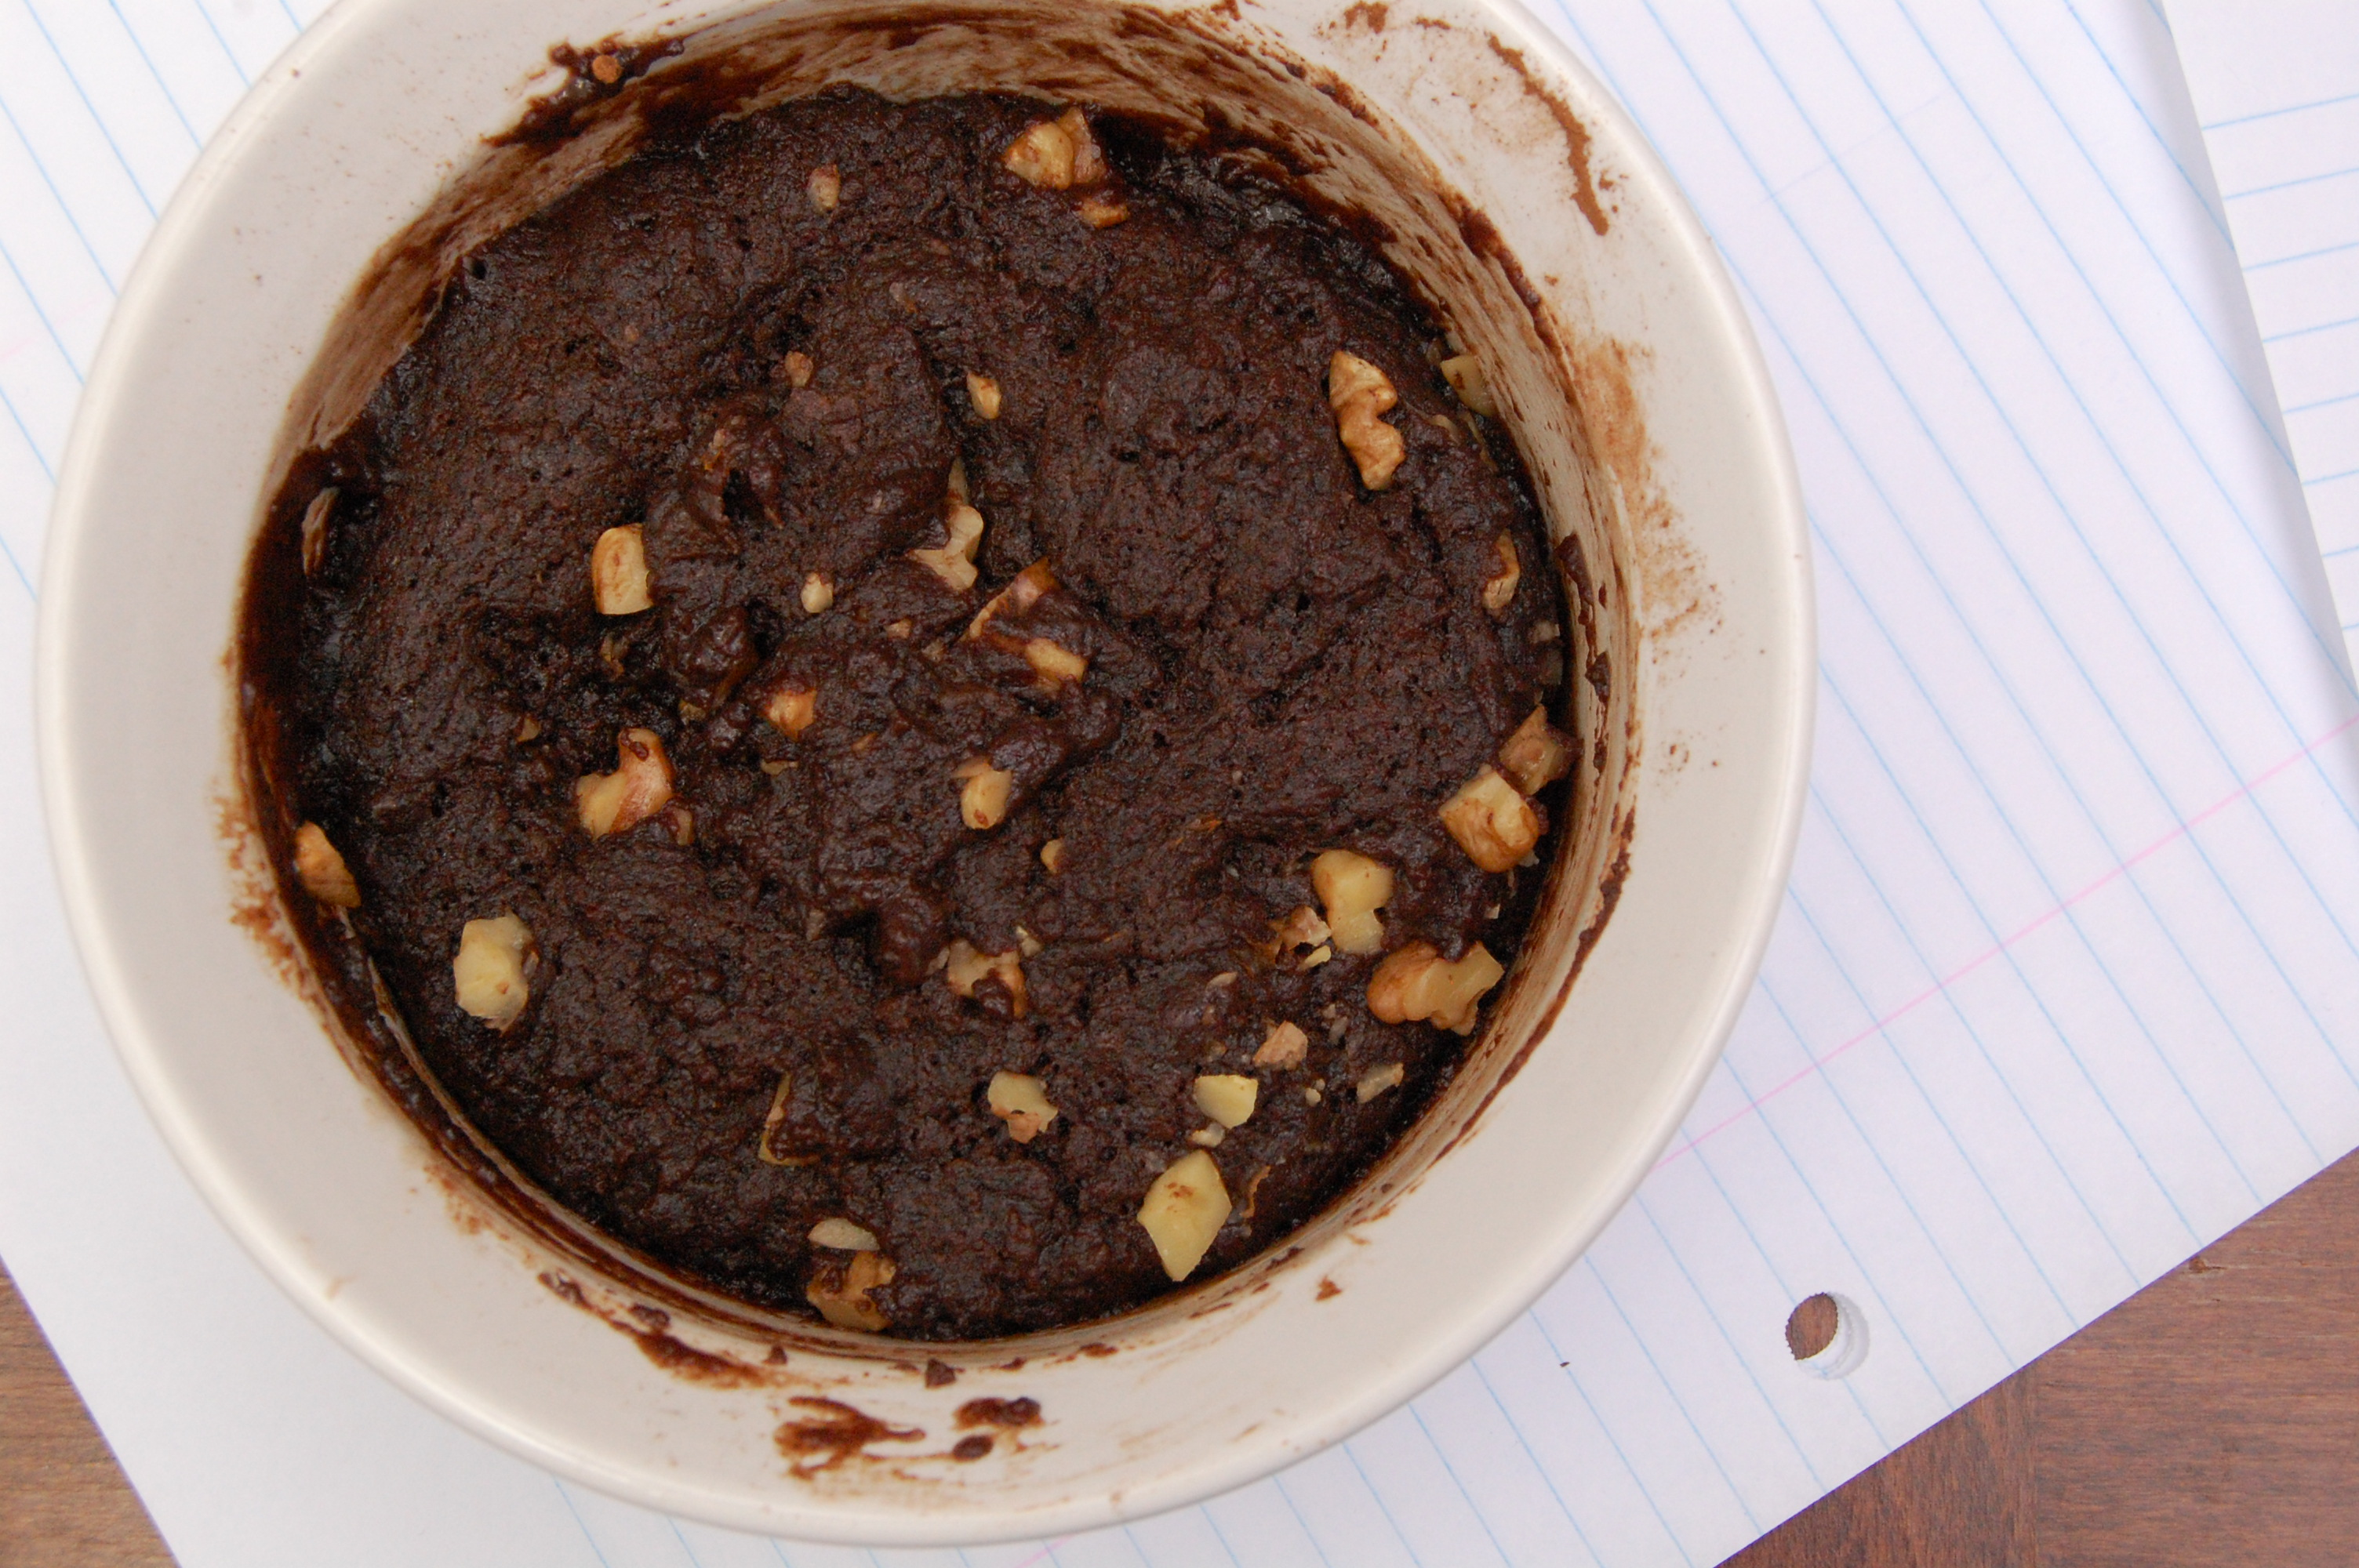 single serve chocolate fudge brownie with walnuts